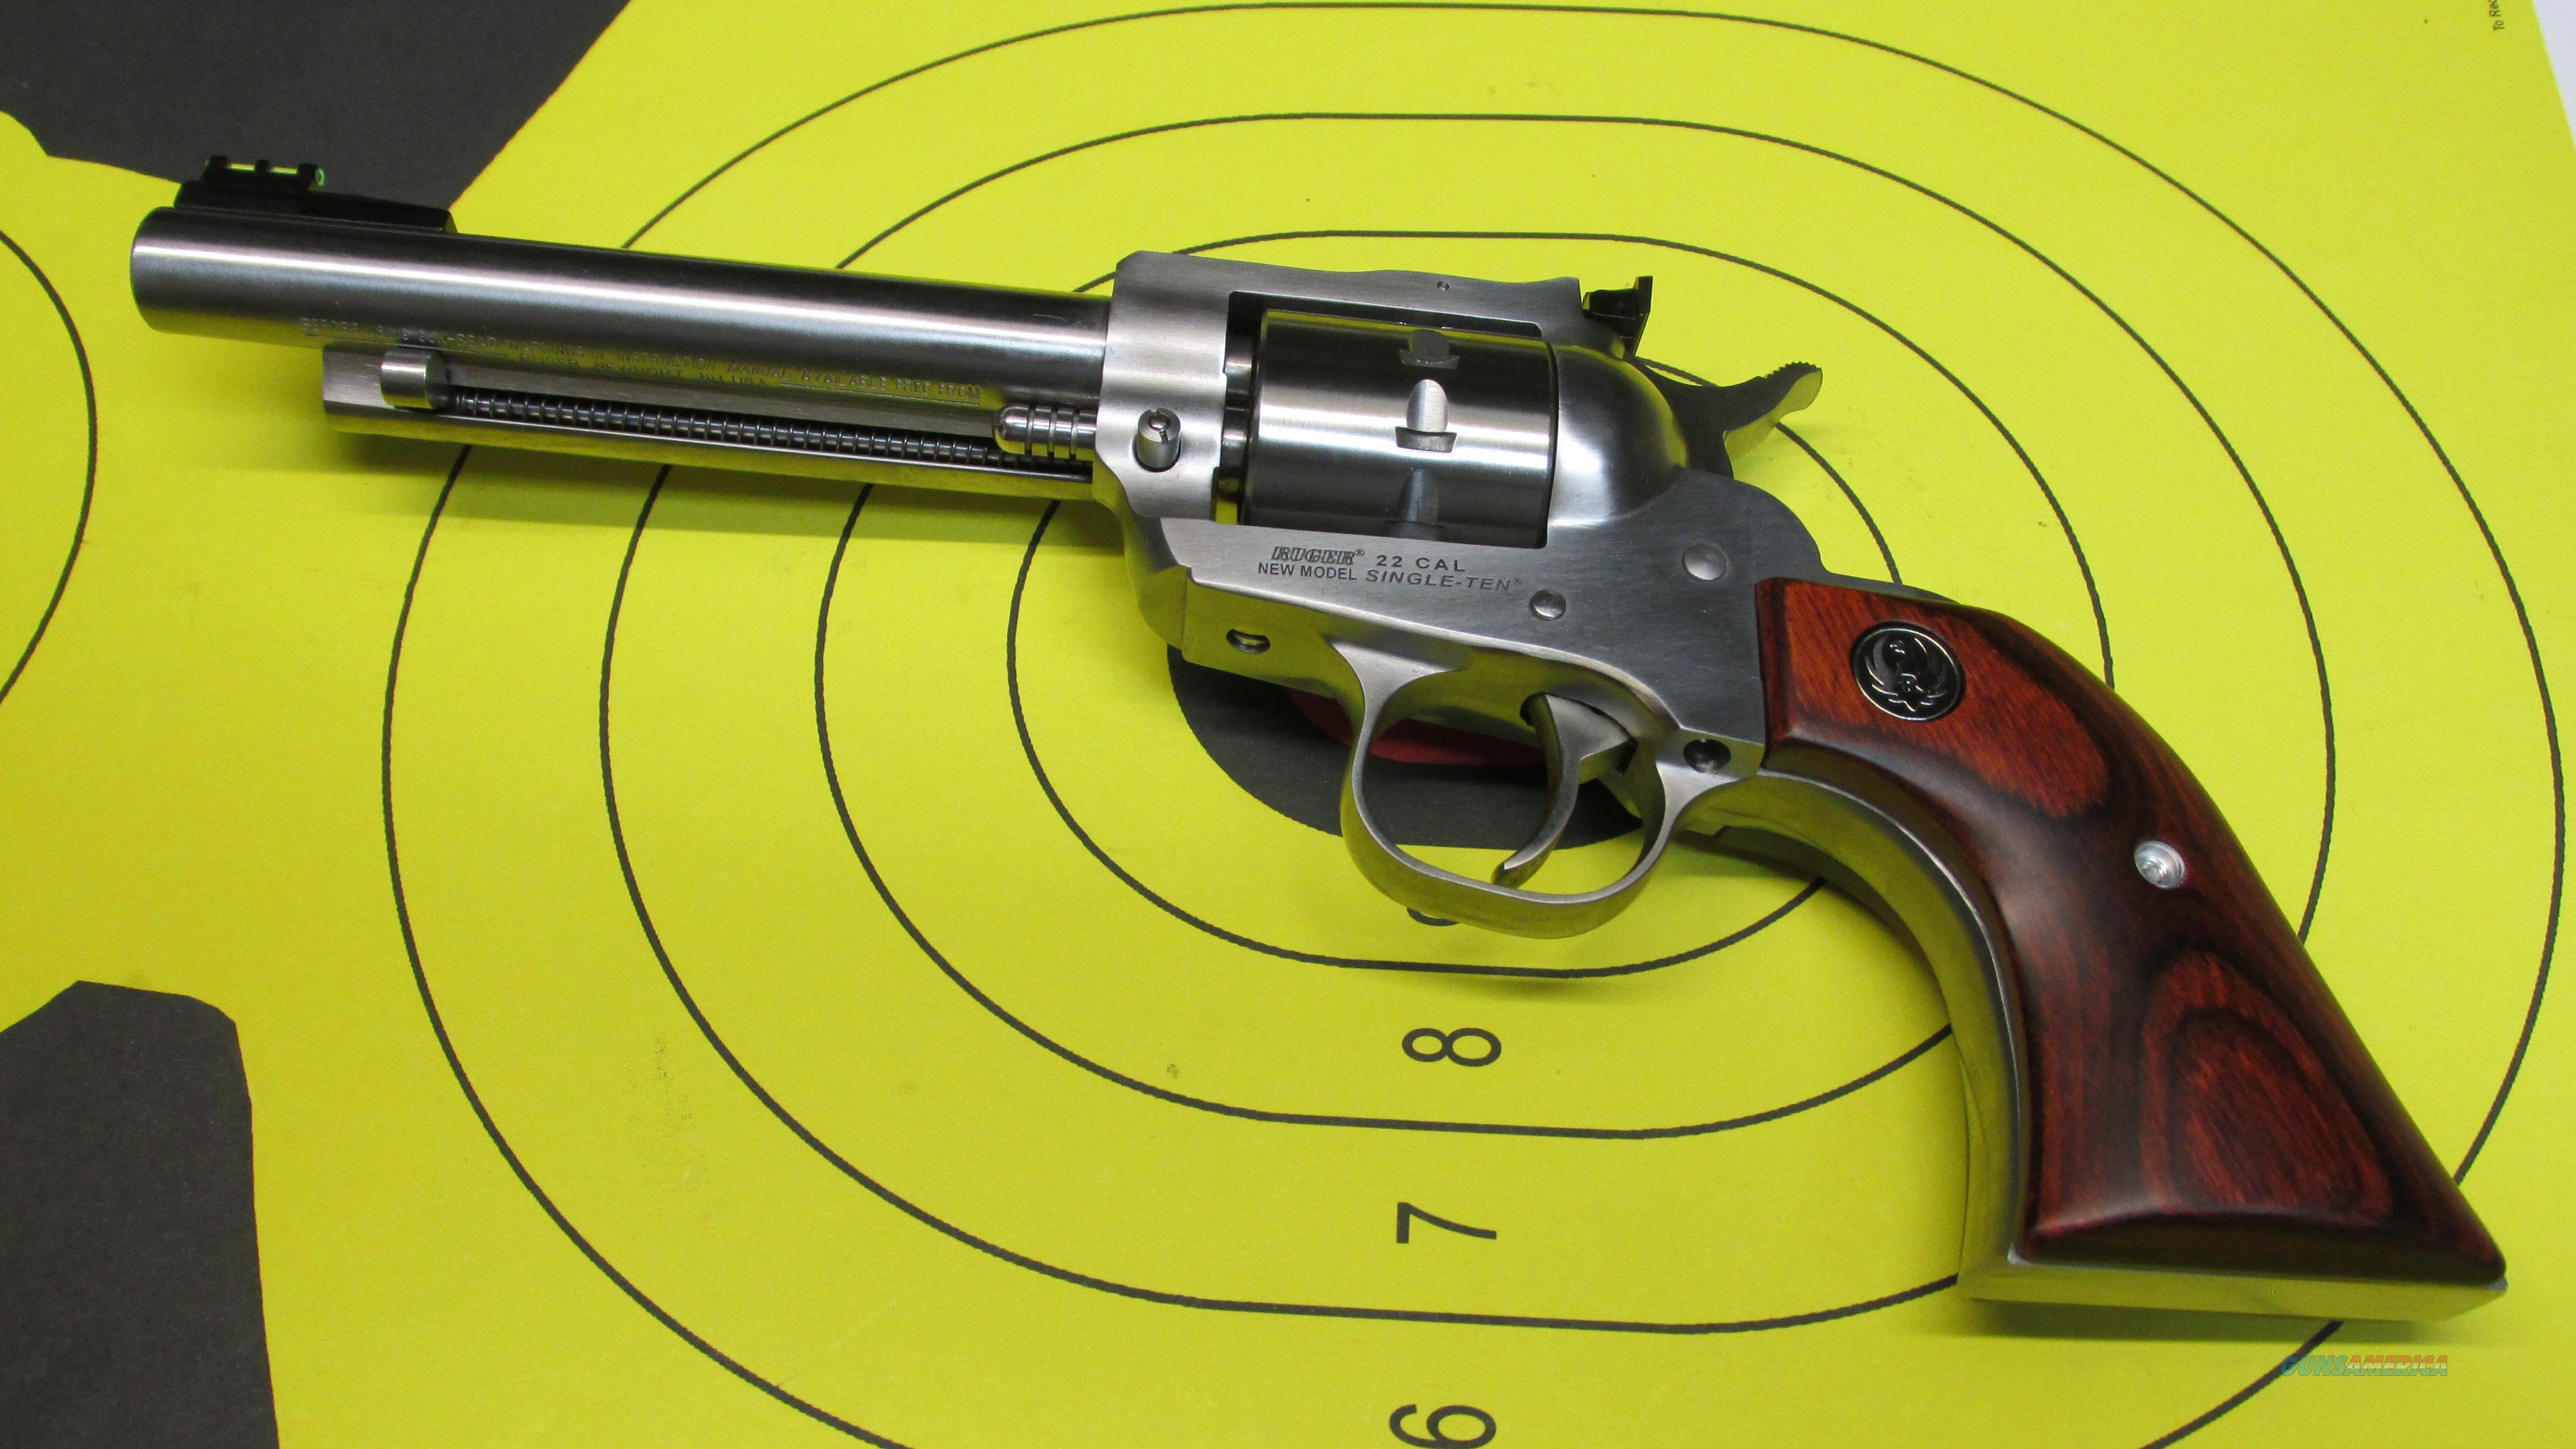 "RUGER SINGLE TEN, 10 SHOT .22LR SINGLE ACTION REVOLVER, 5.5"" BARREL  Guns > Pistols > Ruger Single Action Revolvers > Single Six Type"